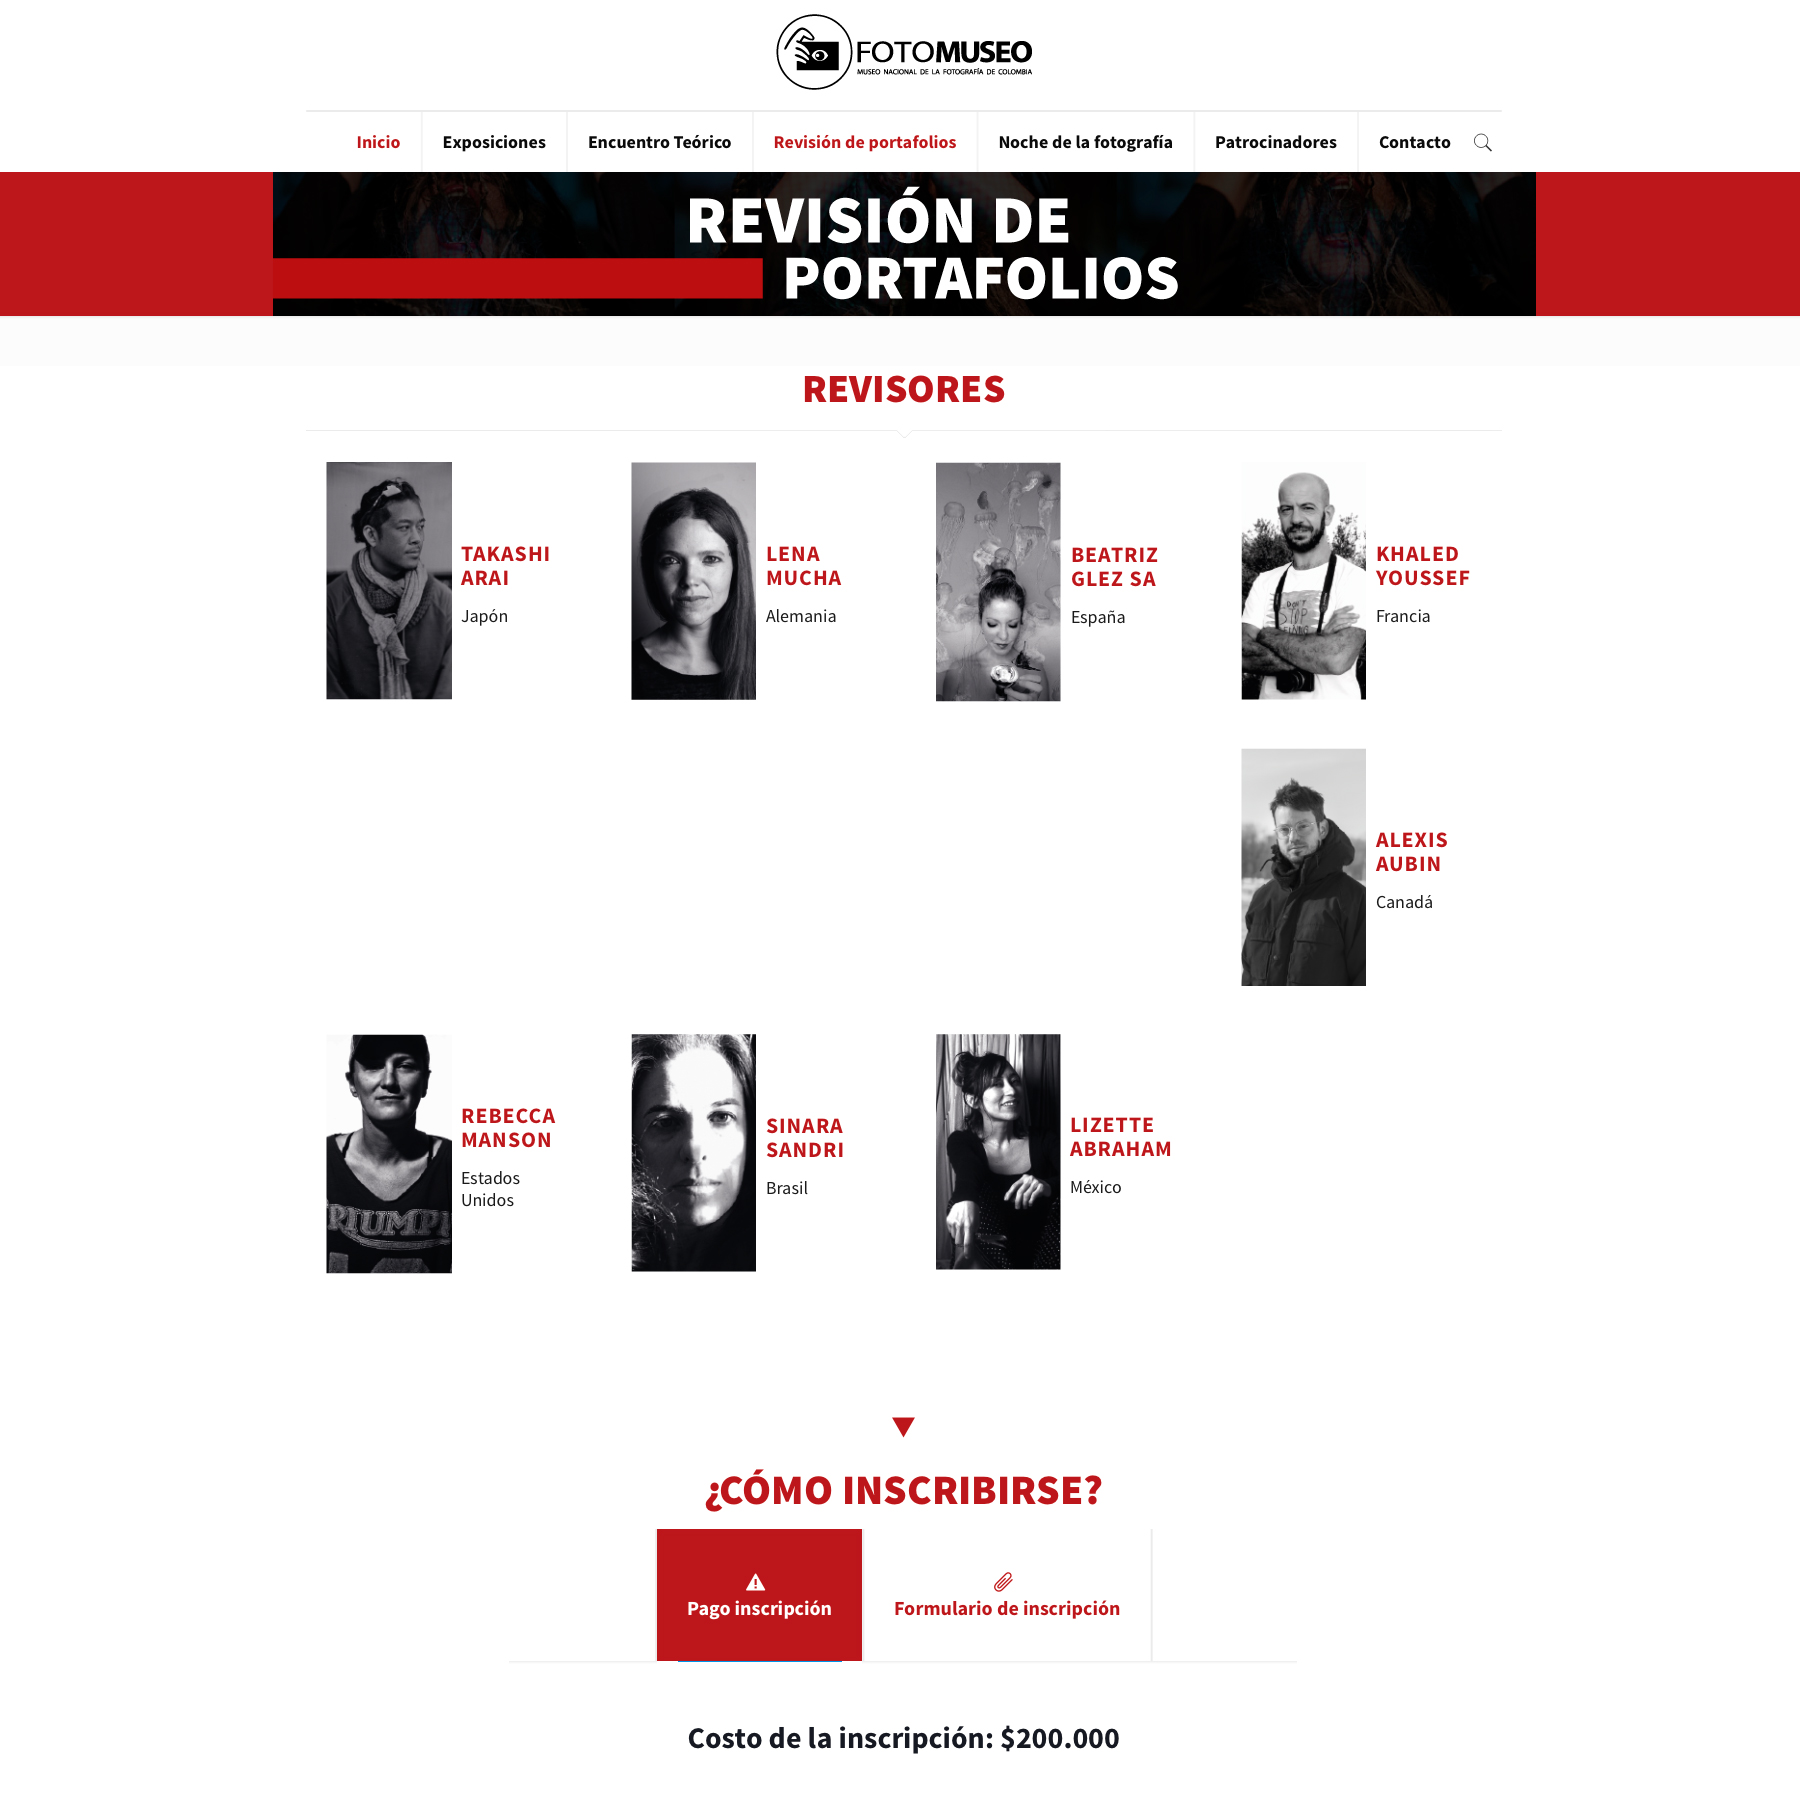 http://www.fotomuseo.org/fotografica-2019/revision-de-portafolios/